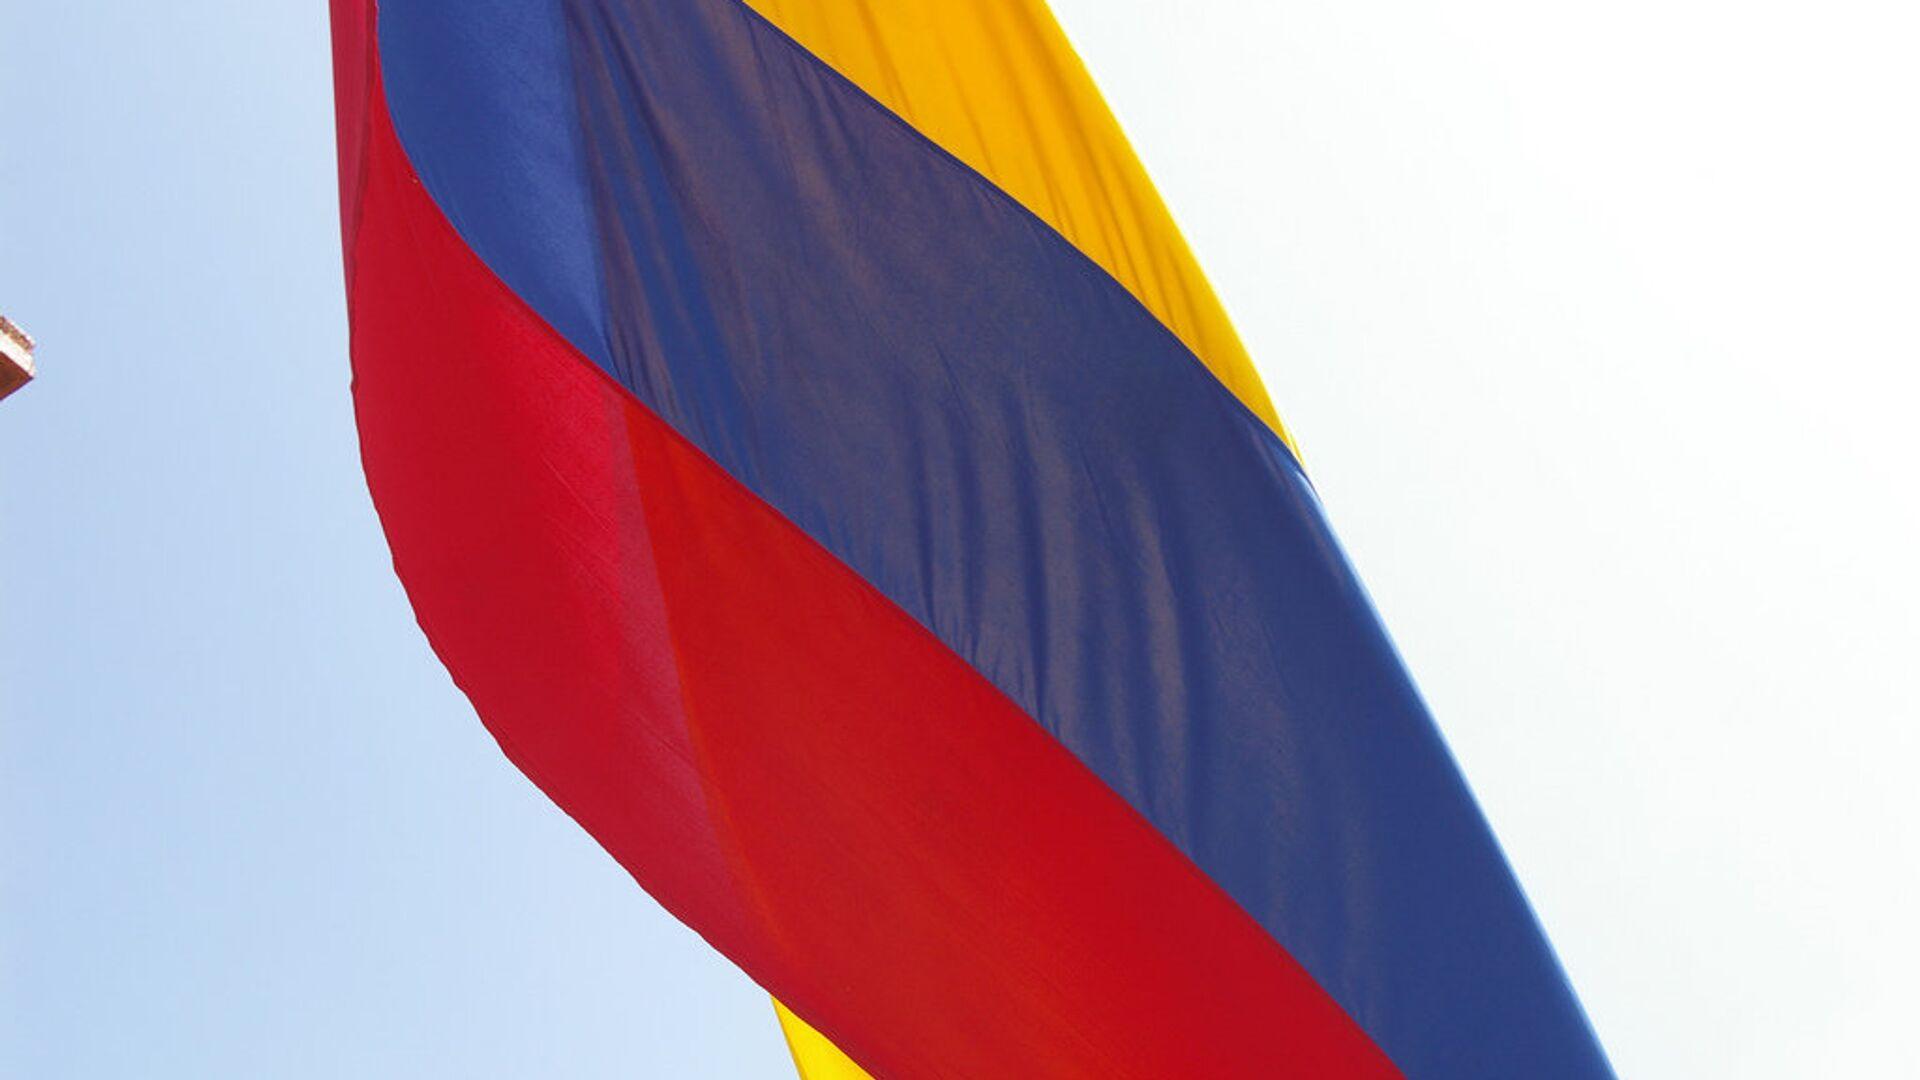 Bandera de Colombia - Sputnik Mundo, 1920, 28.07.2021